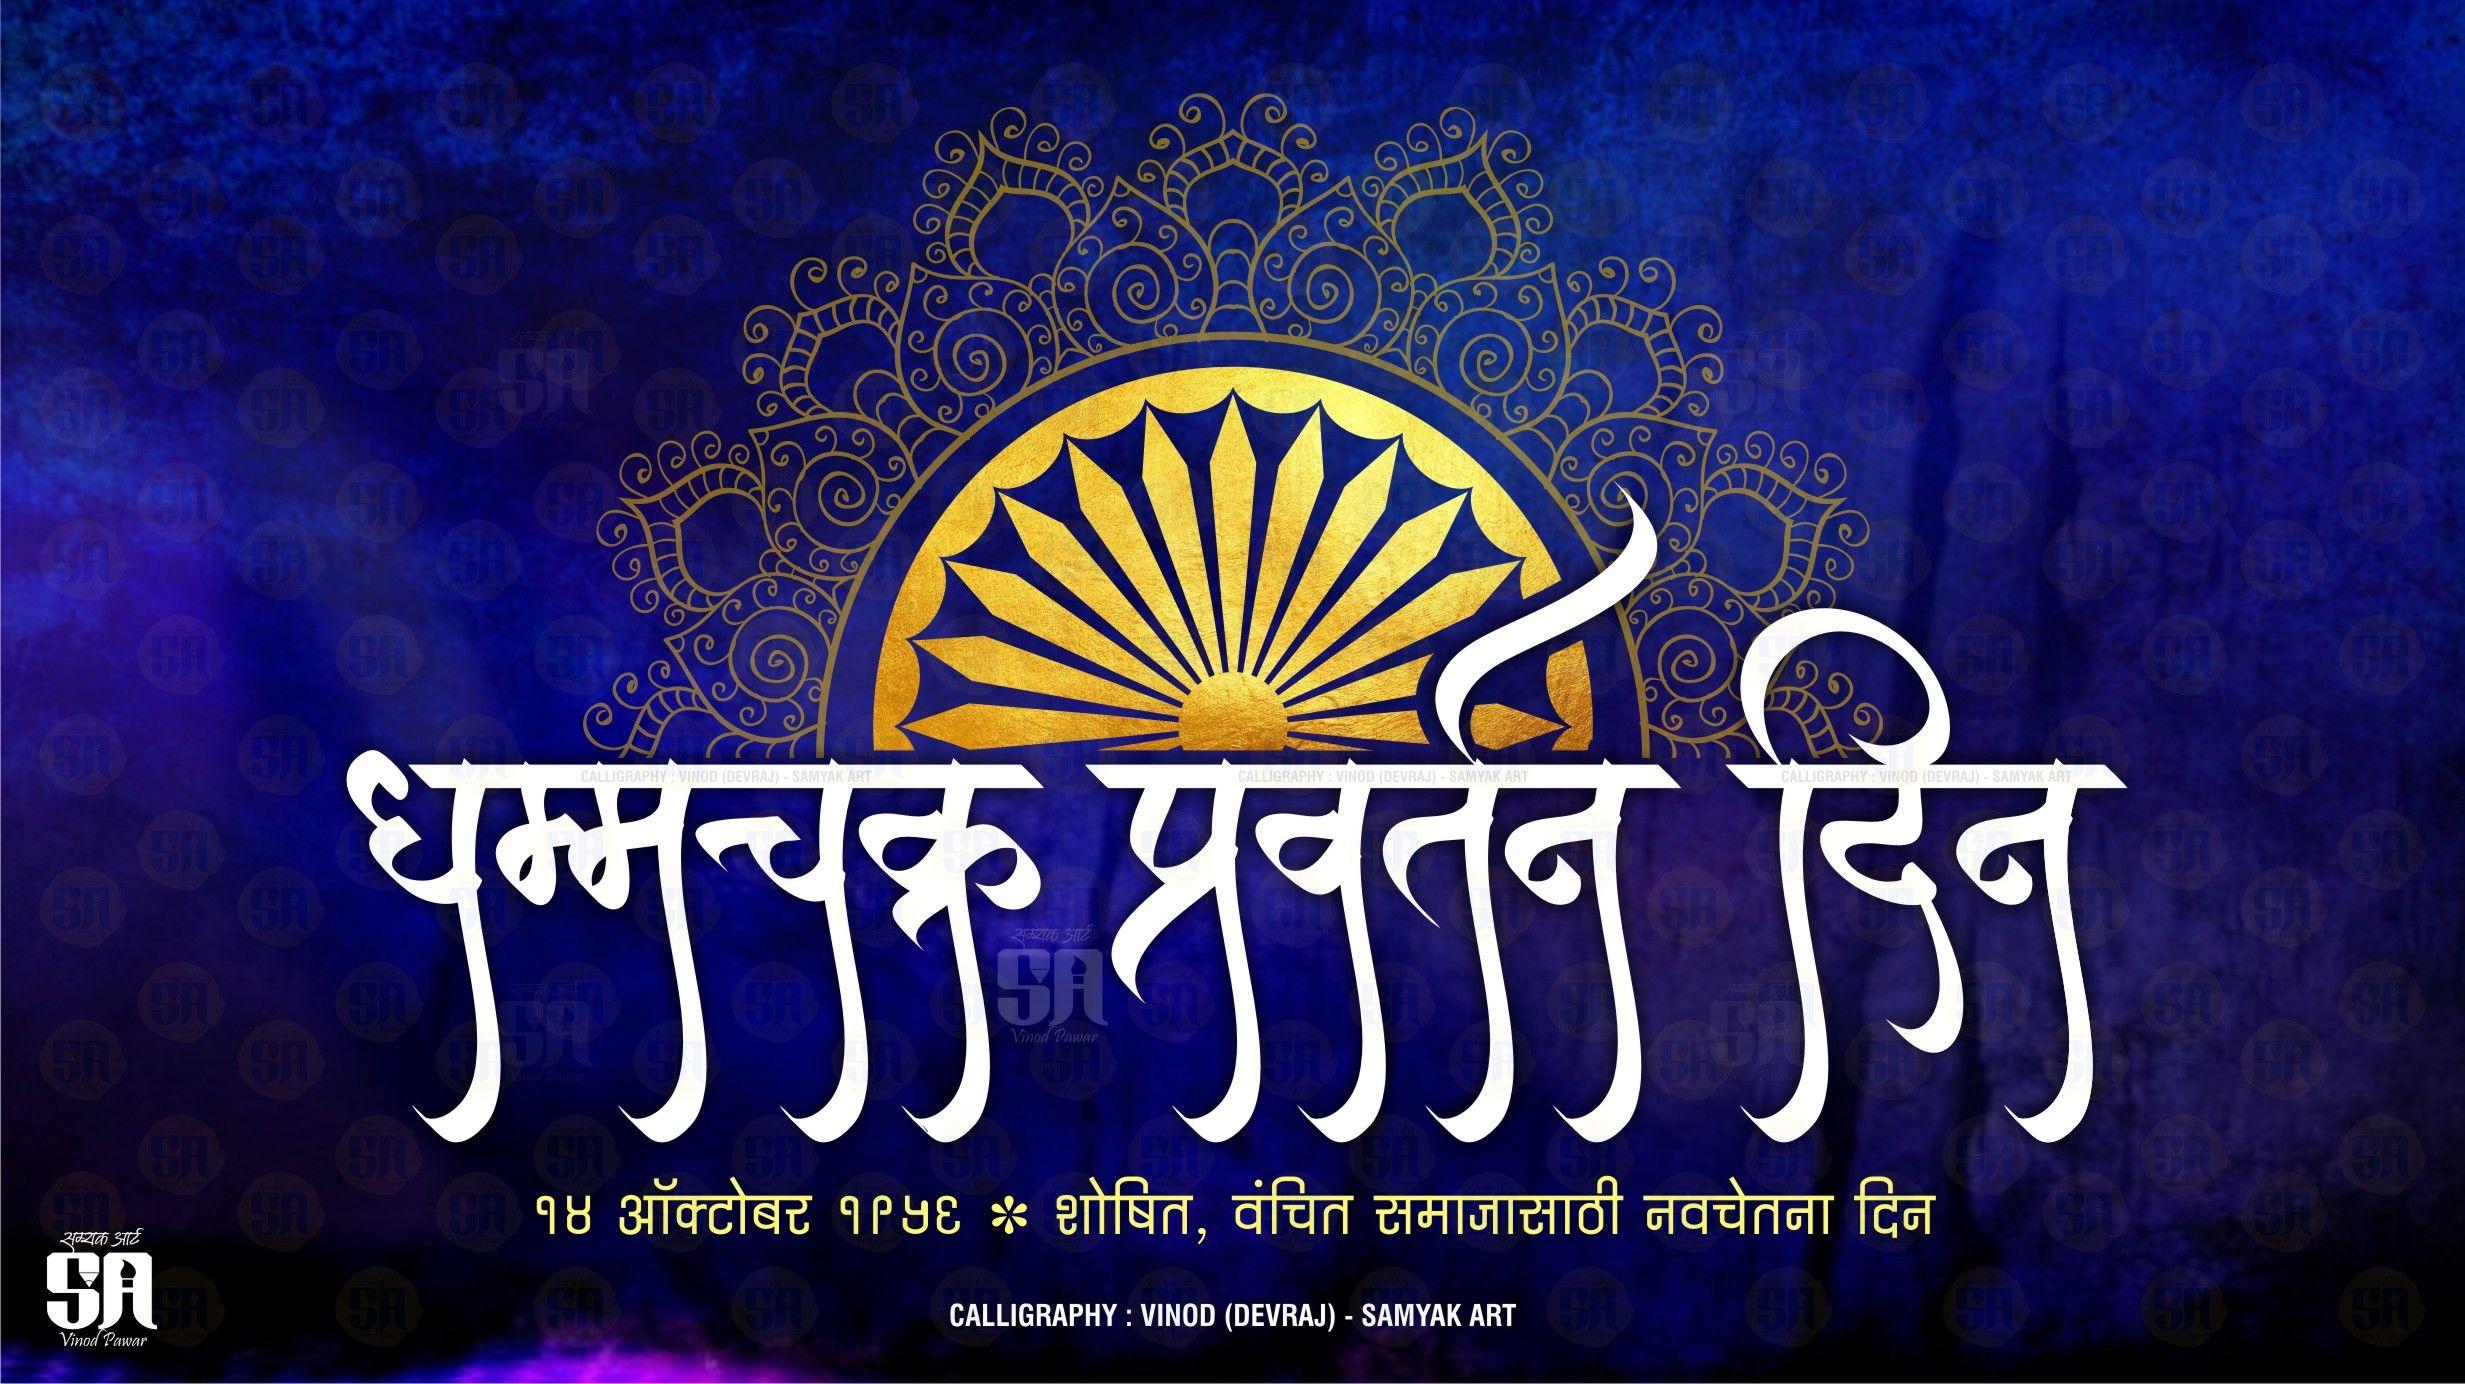 Dhammachakra Ashok Chakra 14 October Calligraphy Devnagari Calligraphy Artwork Photo Album Quote Shivaji Maharaj Wallpapers